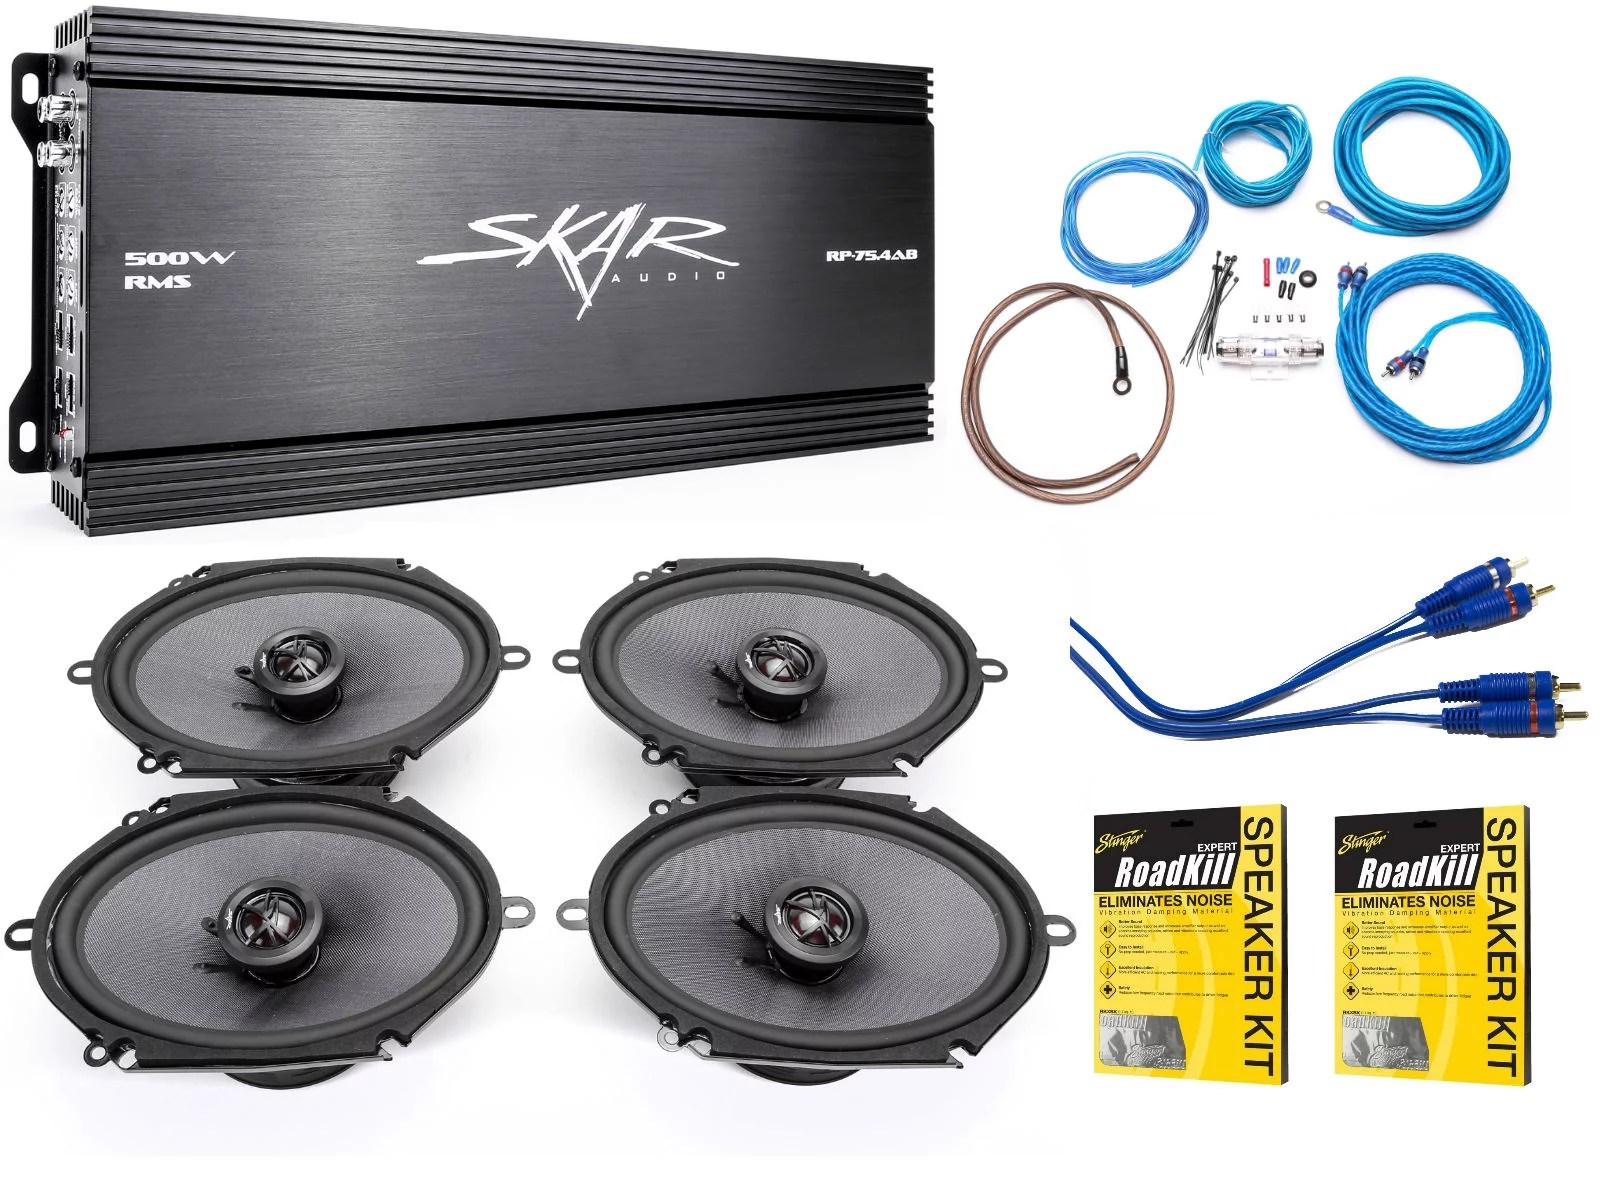 skar audio 6 x8 complete elite speaker upgrade package with skar audio setup skar audio wiring [ 1600 x 1200 Pixel ]